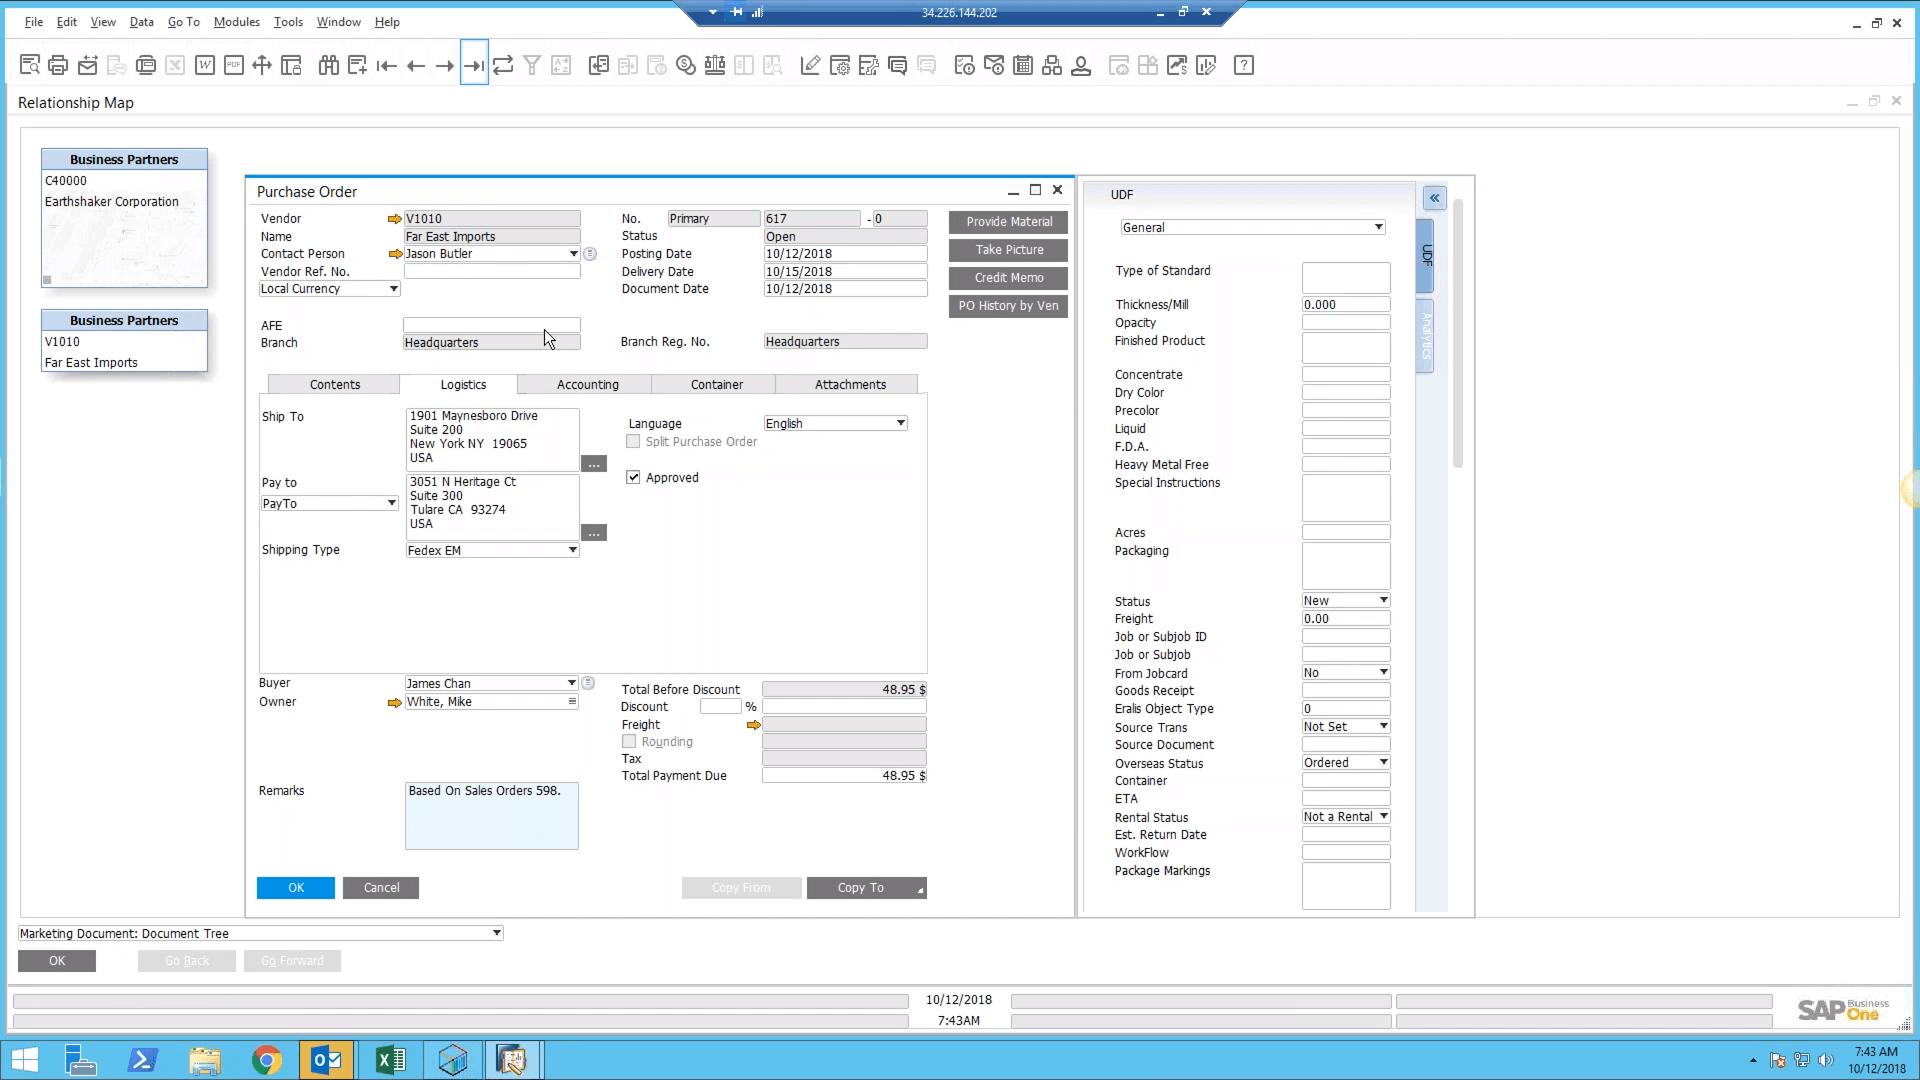 SAP 3.3_1920_compressed